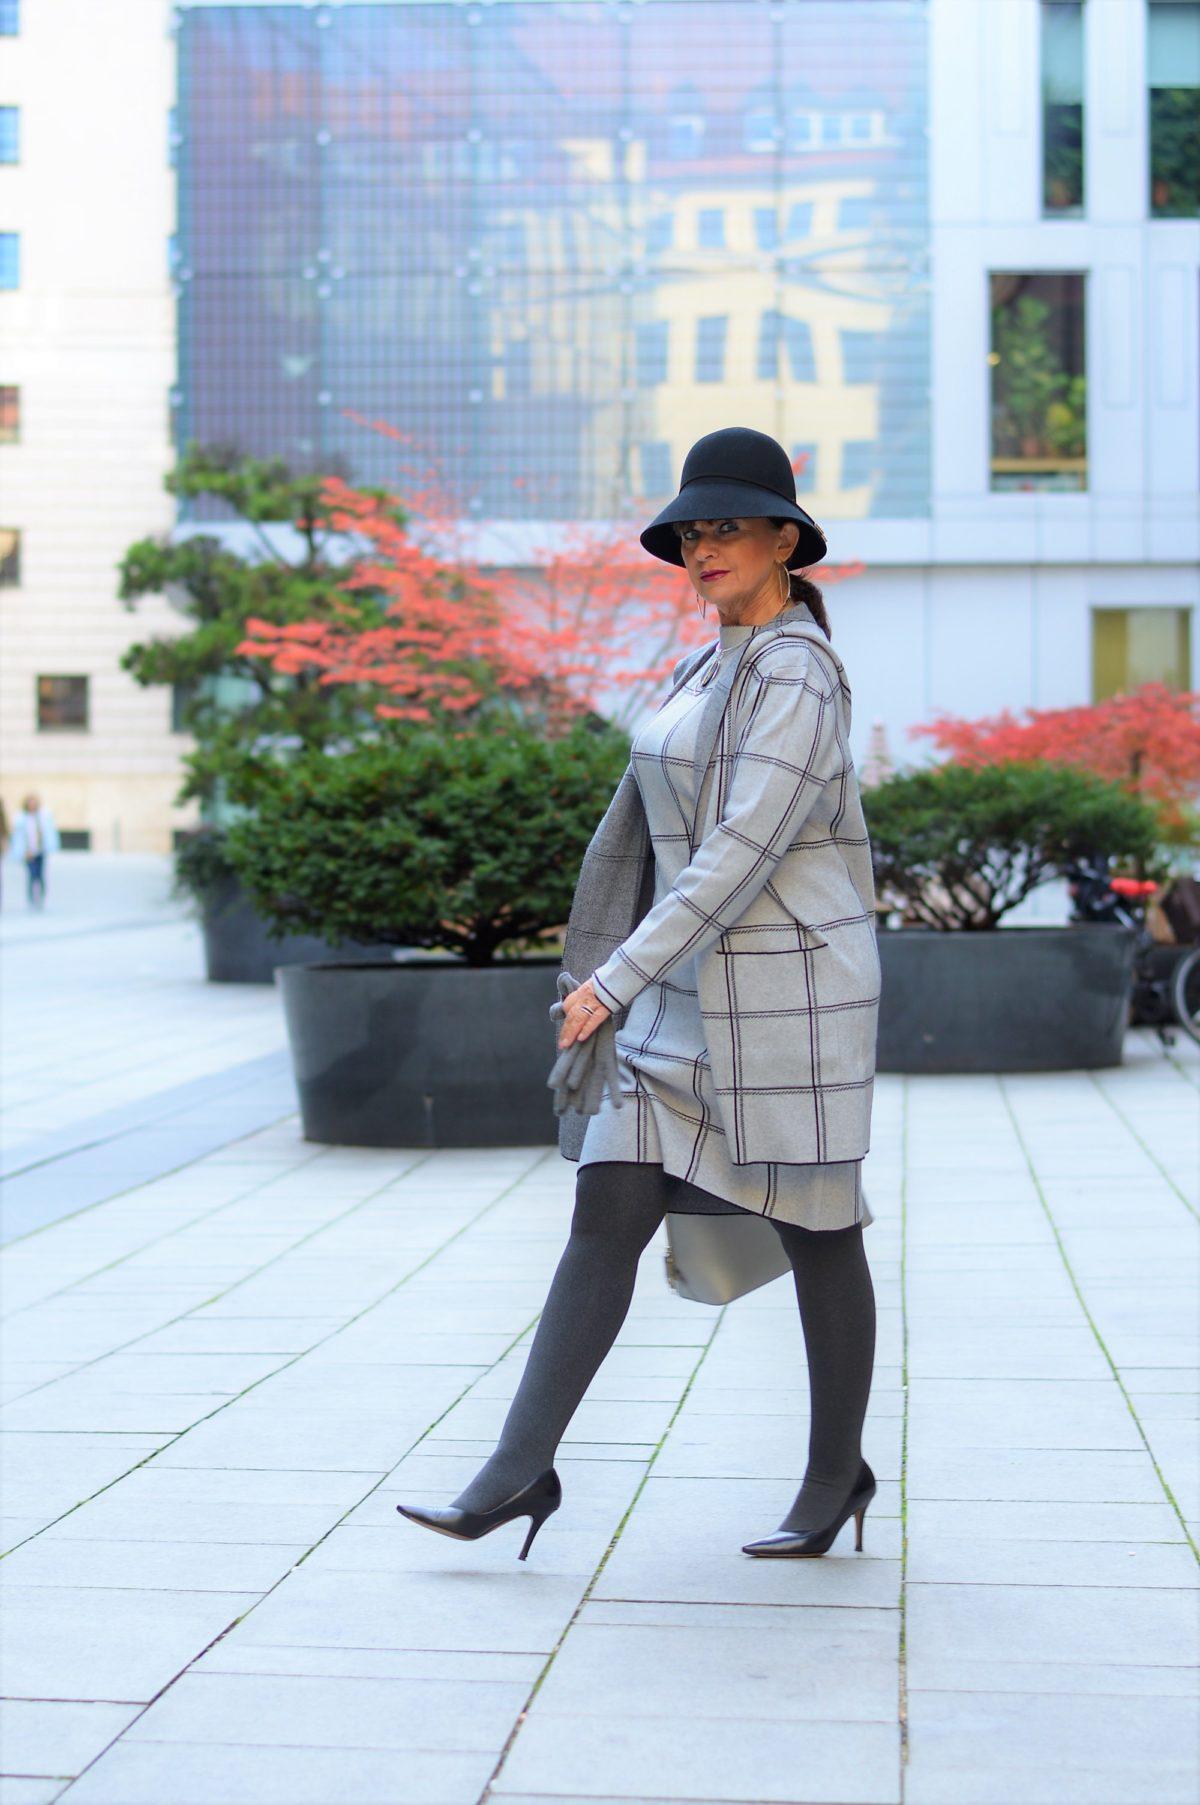 schick in strick modetrend strickkleid in grau raffiniert kombinieren martina berg lady 50plus. Black Bedroom Furniture Sets. Home Design Ideas